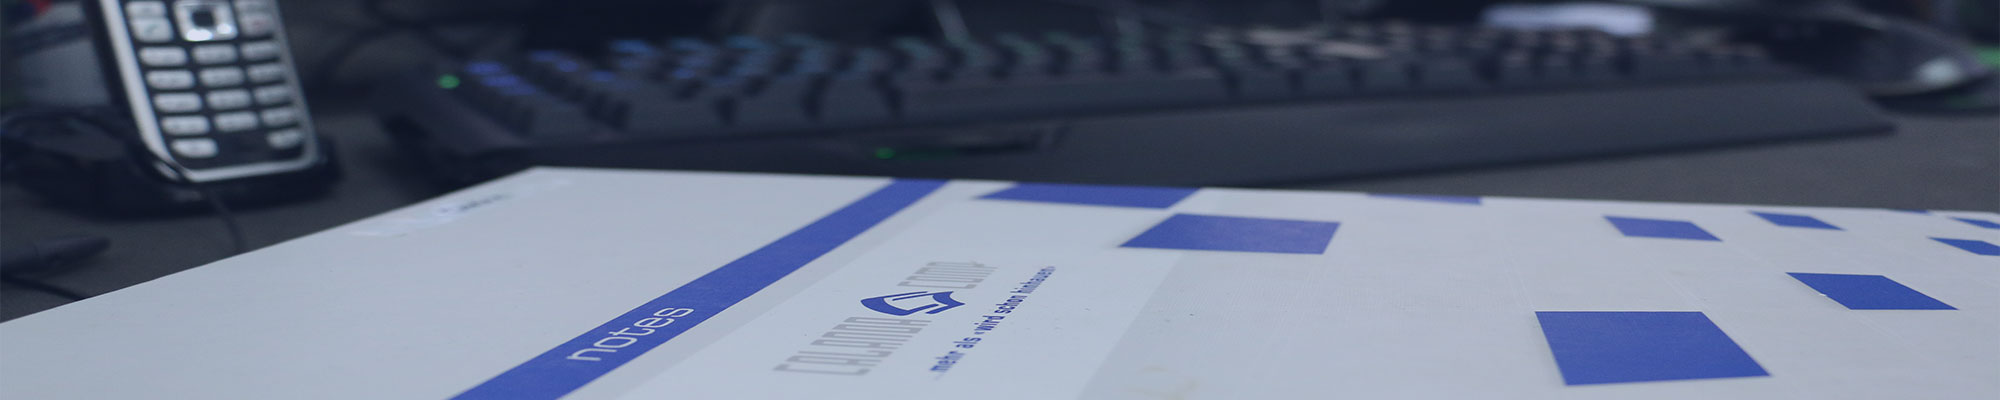 CalandaComp GmbH